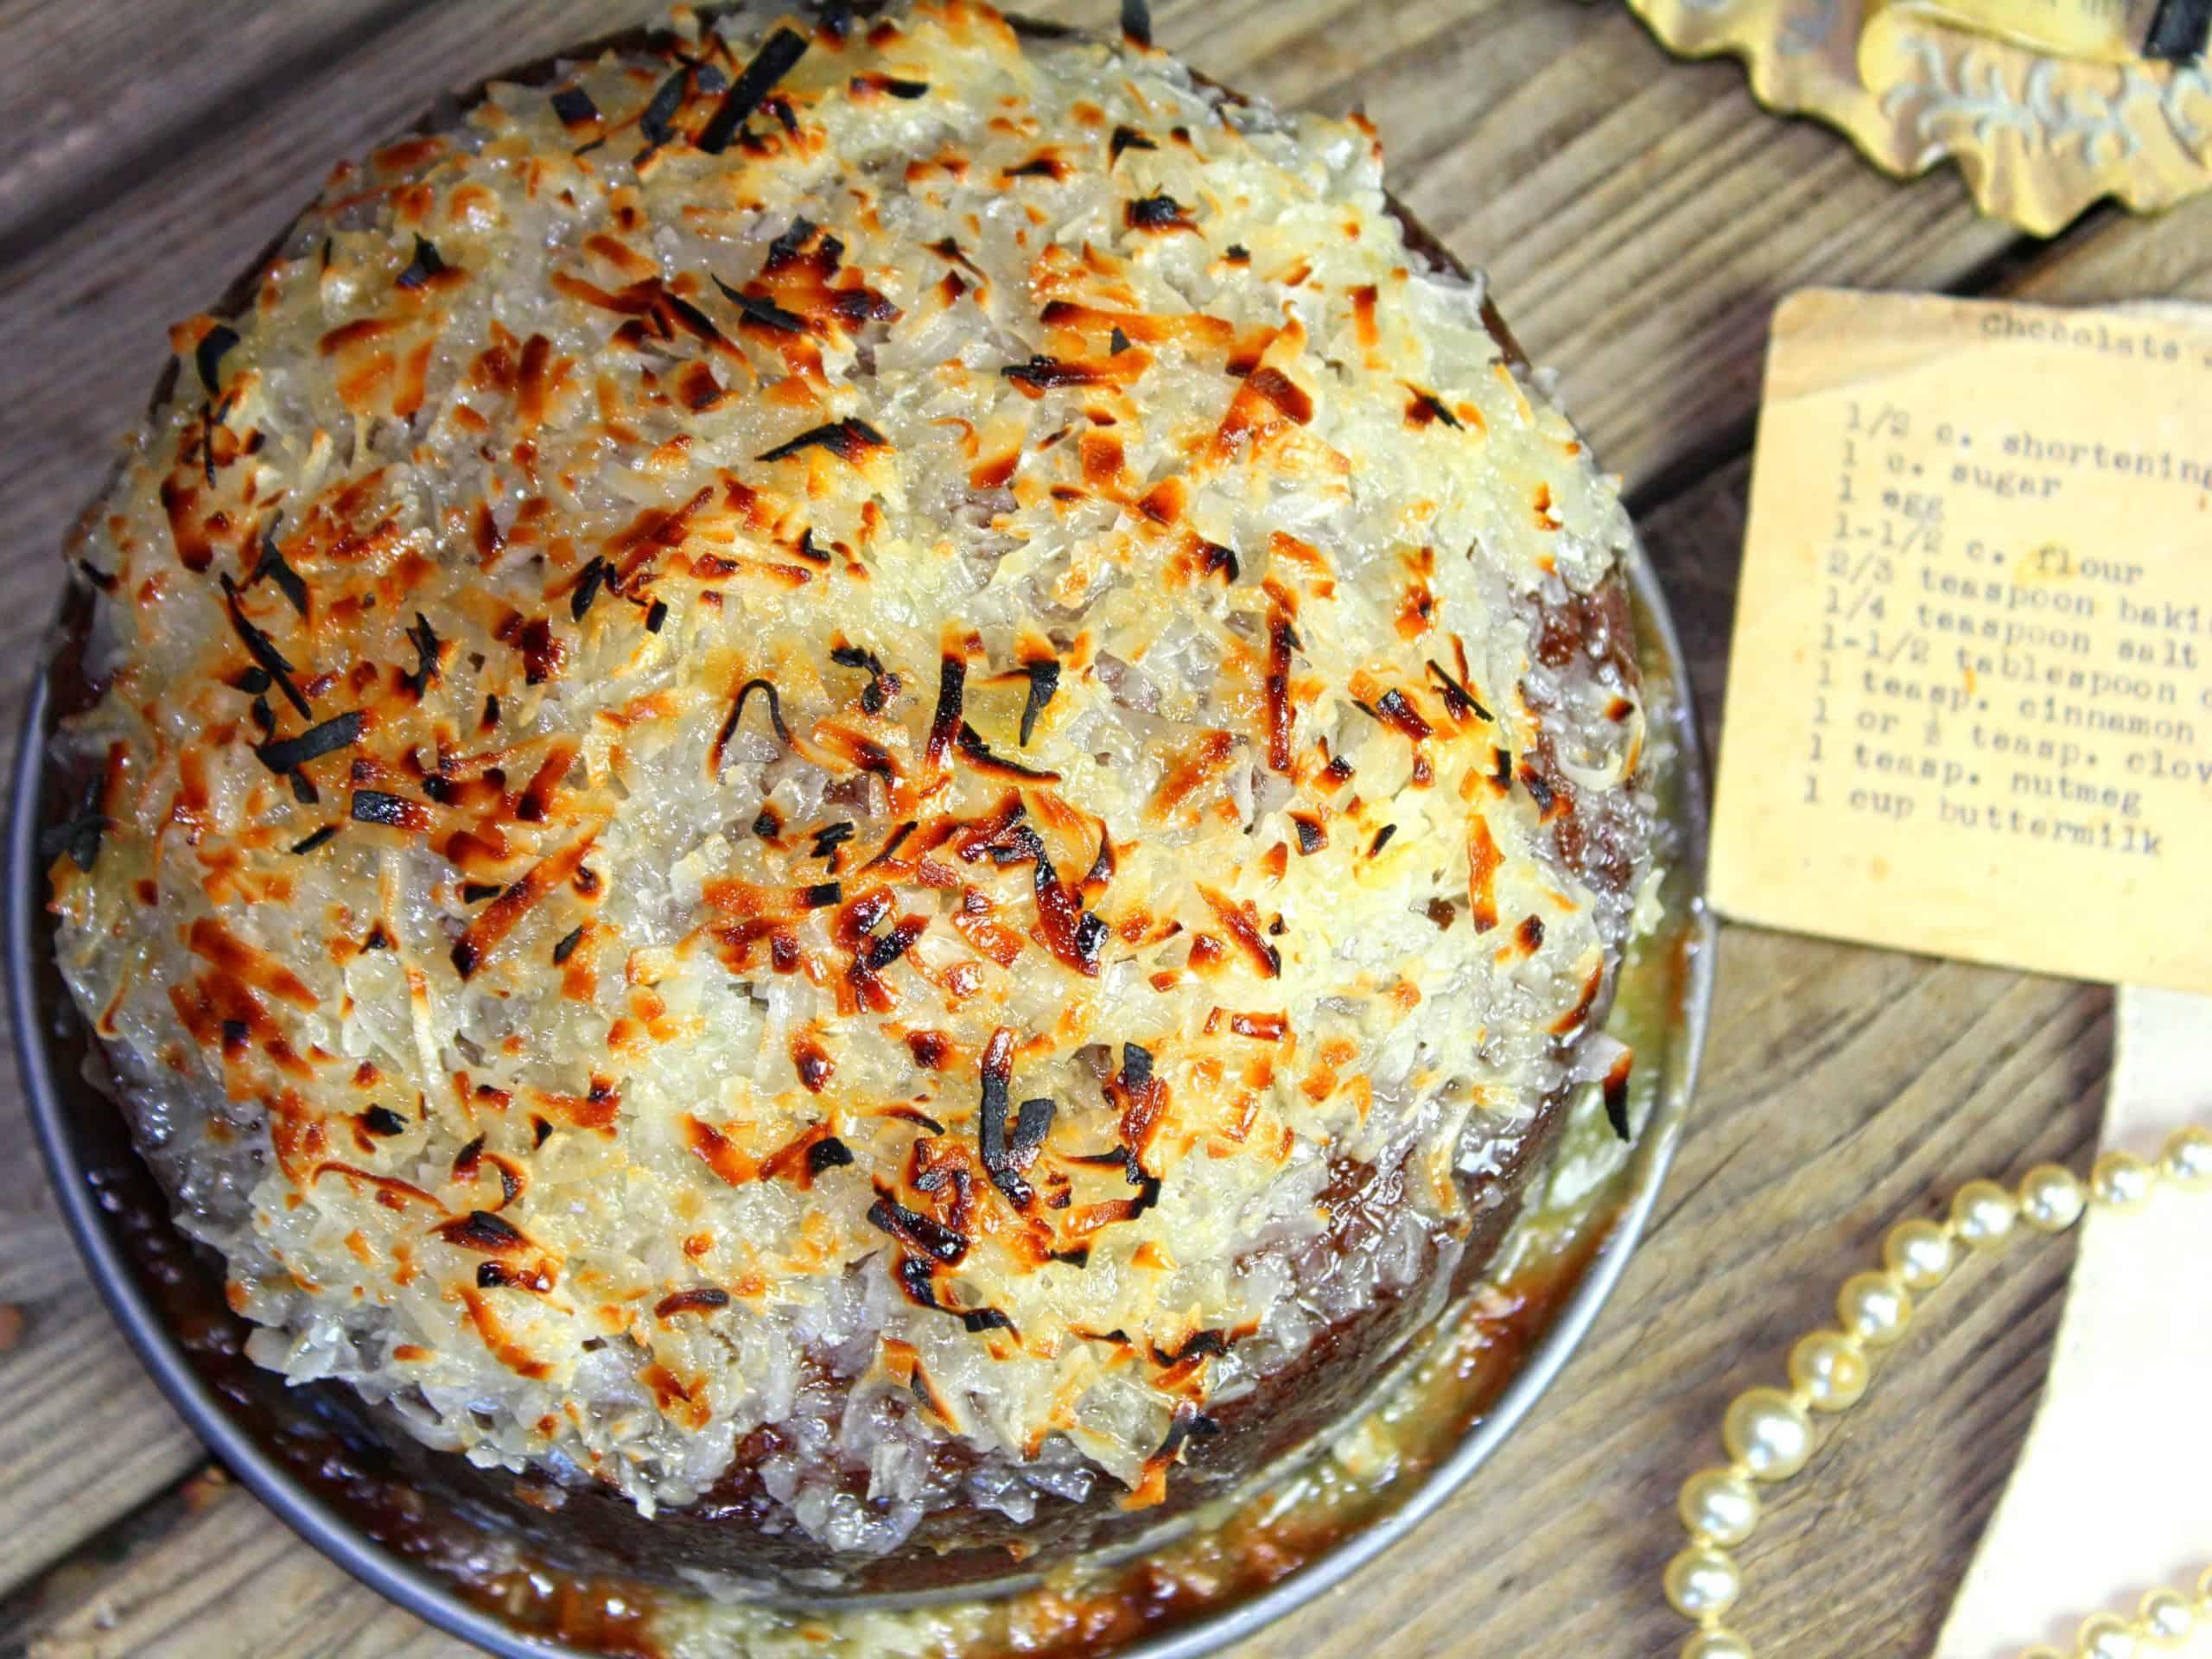 Chocolate spice cake